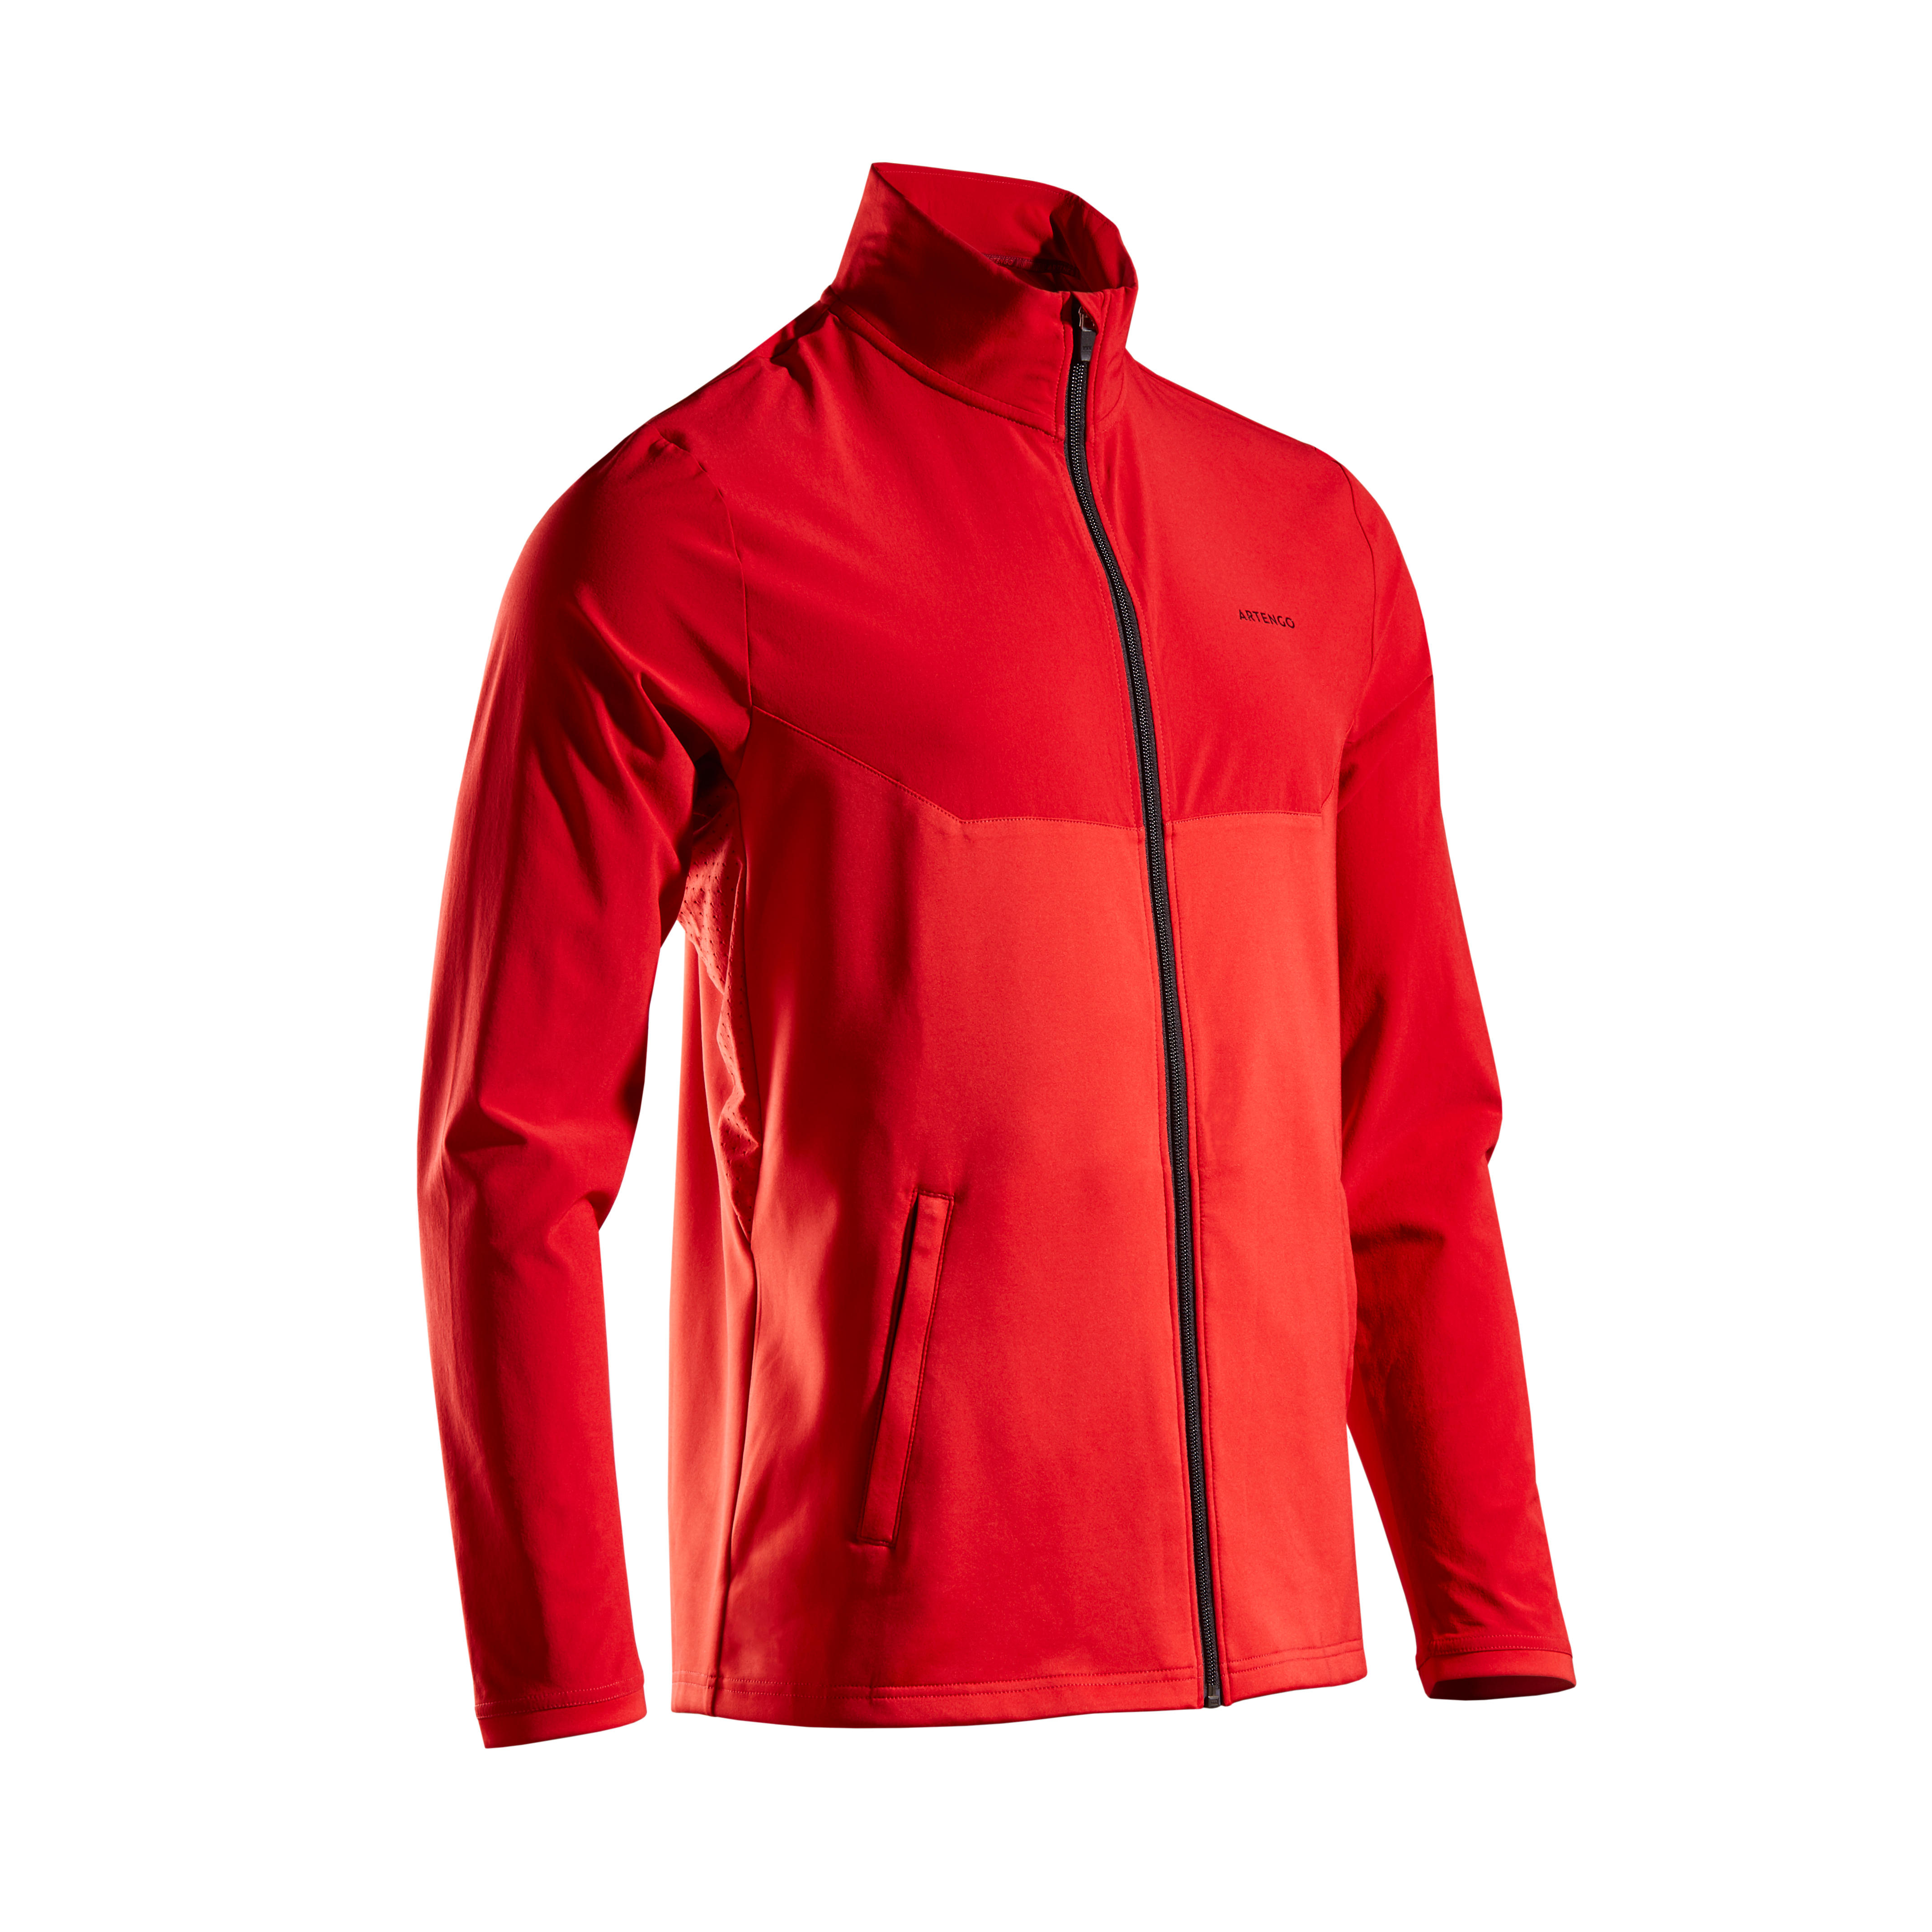 Jachetă Tenis TJA500 Bărbați imagine